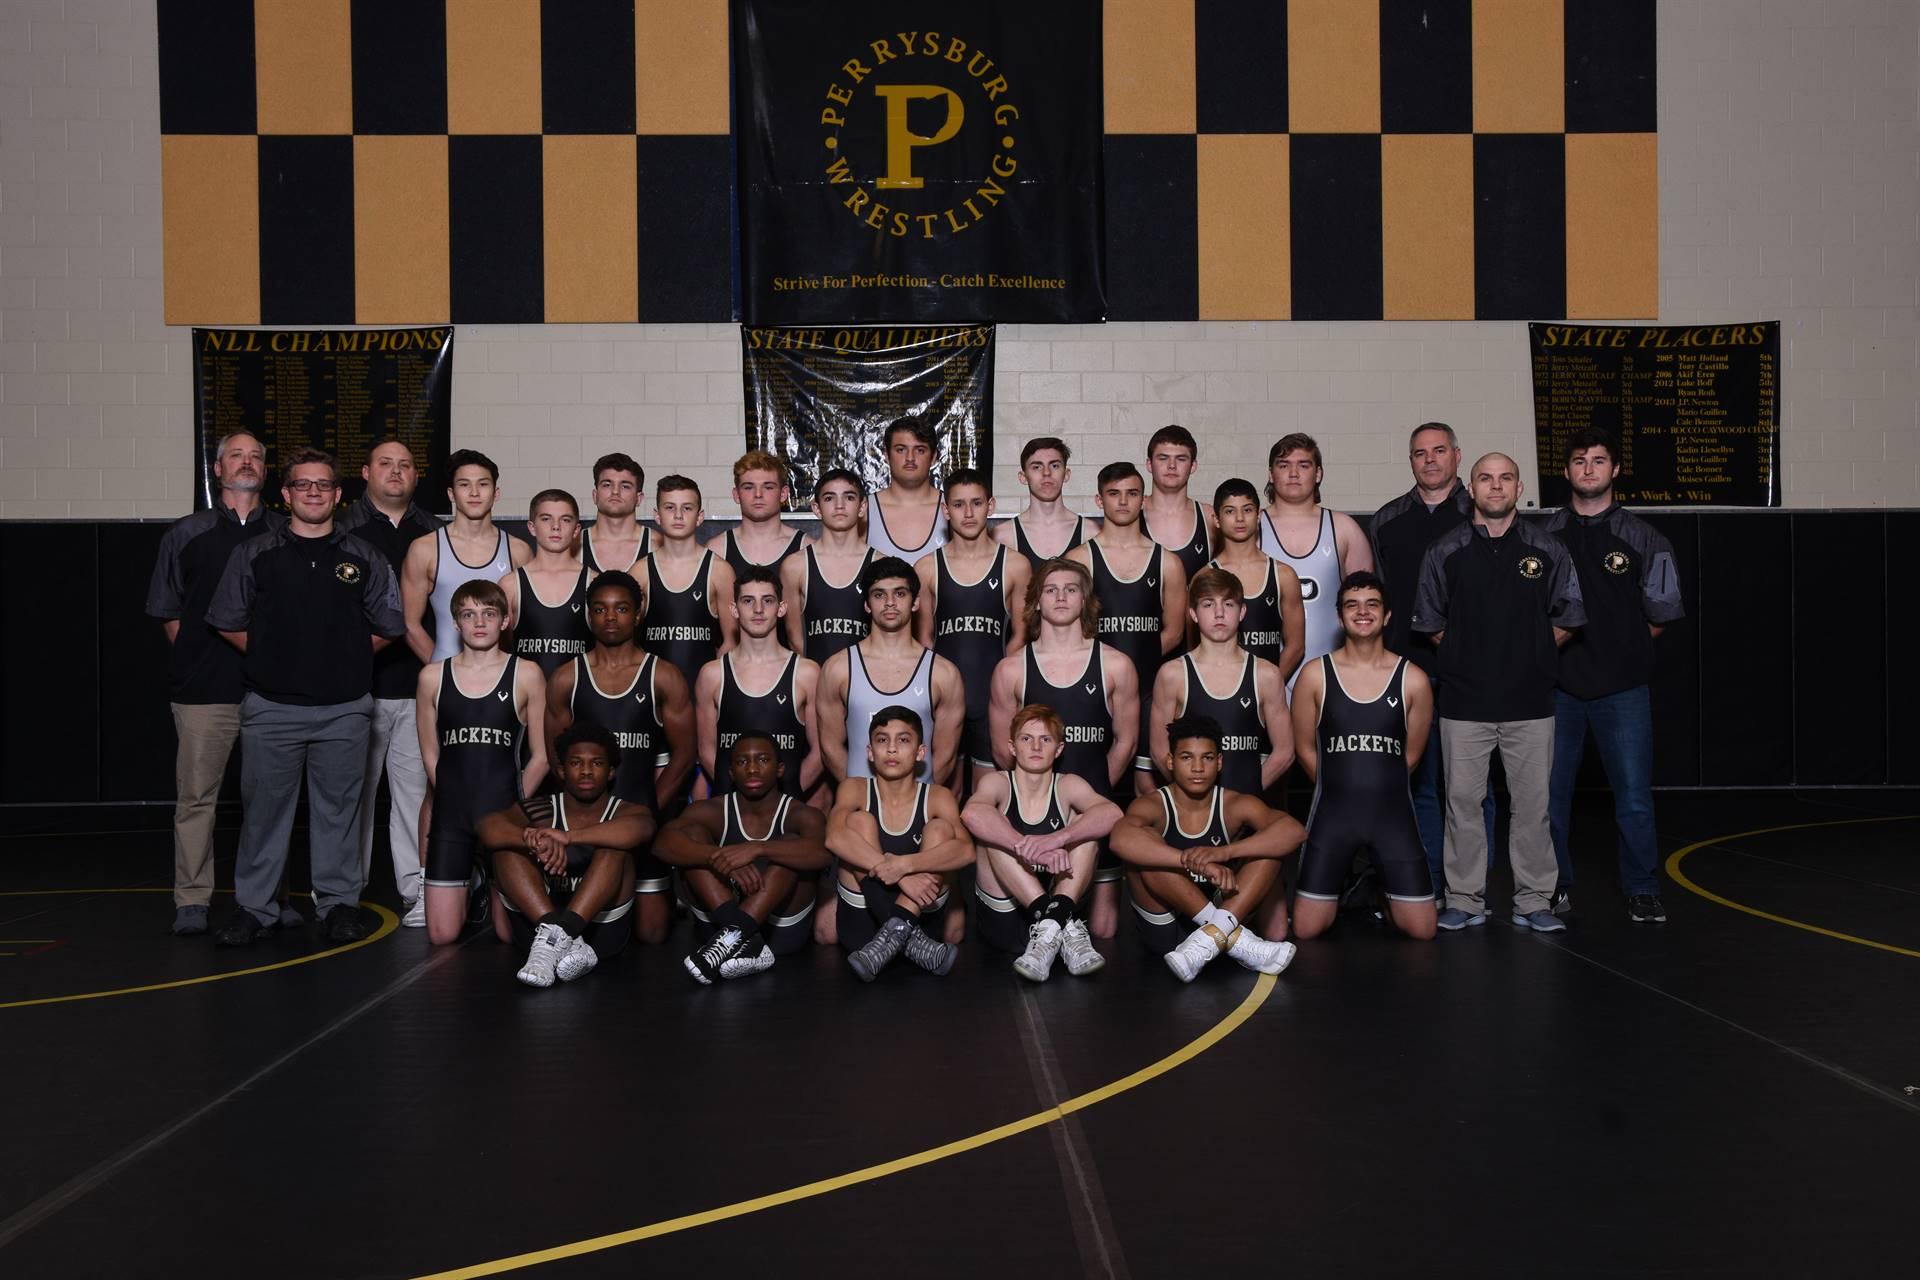 PHS Varsity Wrestling Team Photo